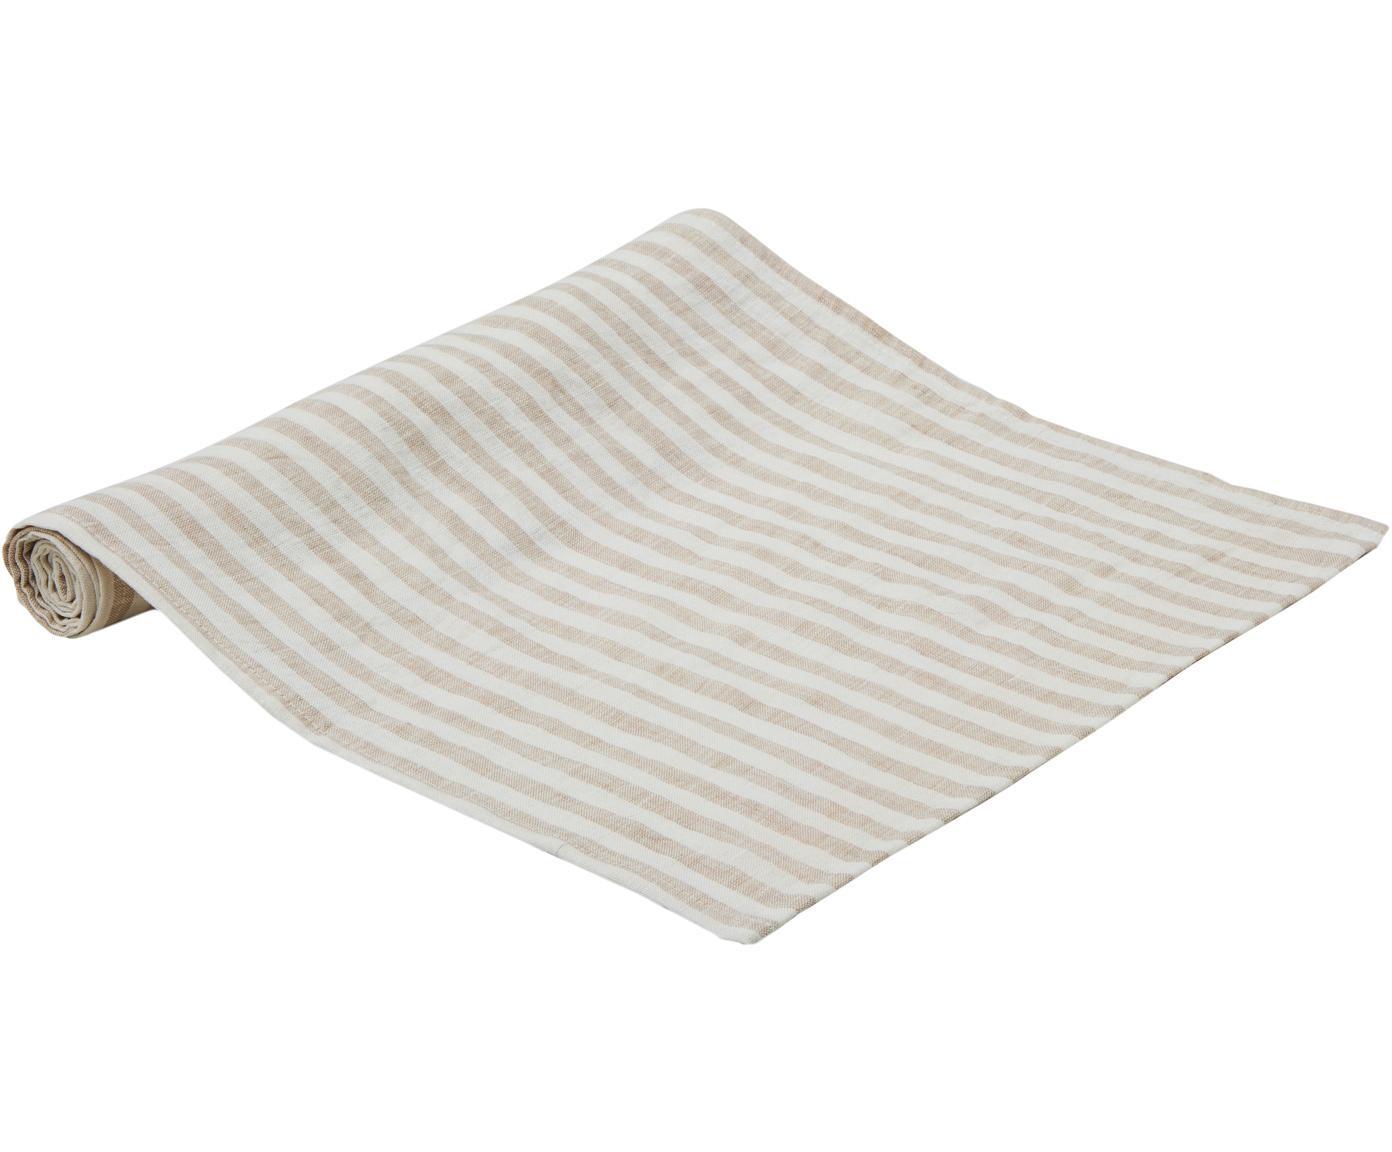 Camino de mesa de lino Solami, Lino, Beige, blanco, An 40 x L 150 cm